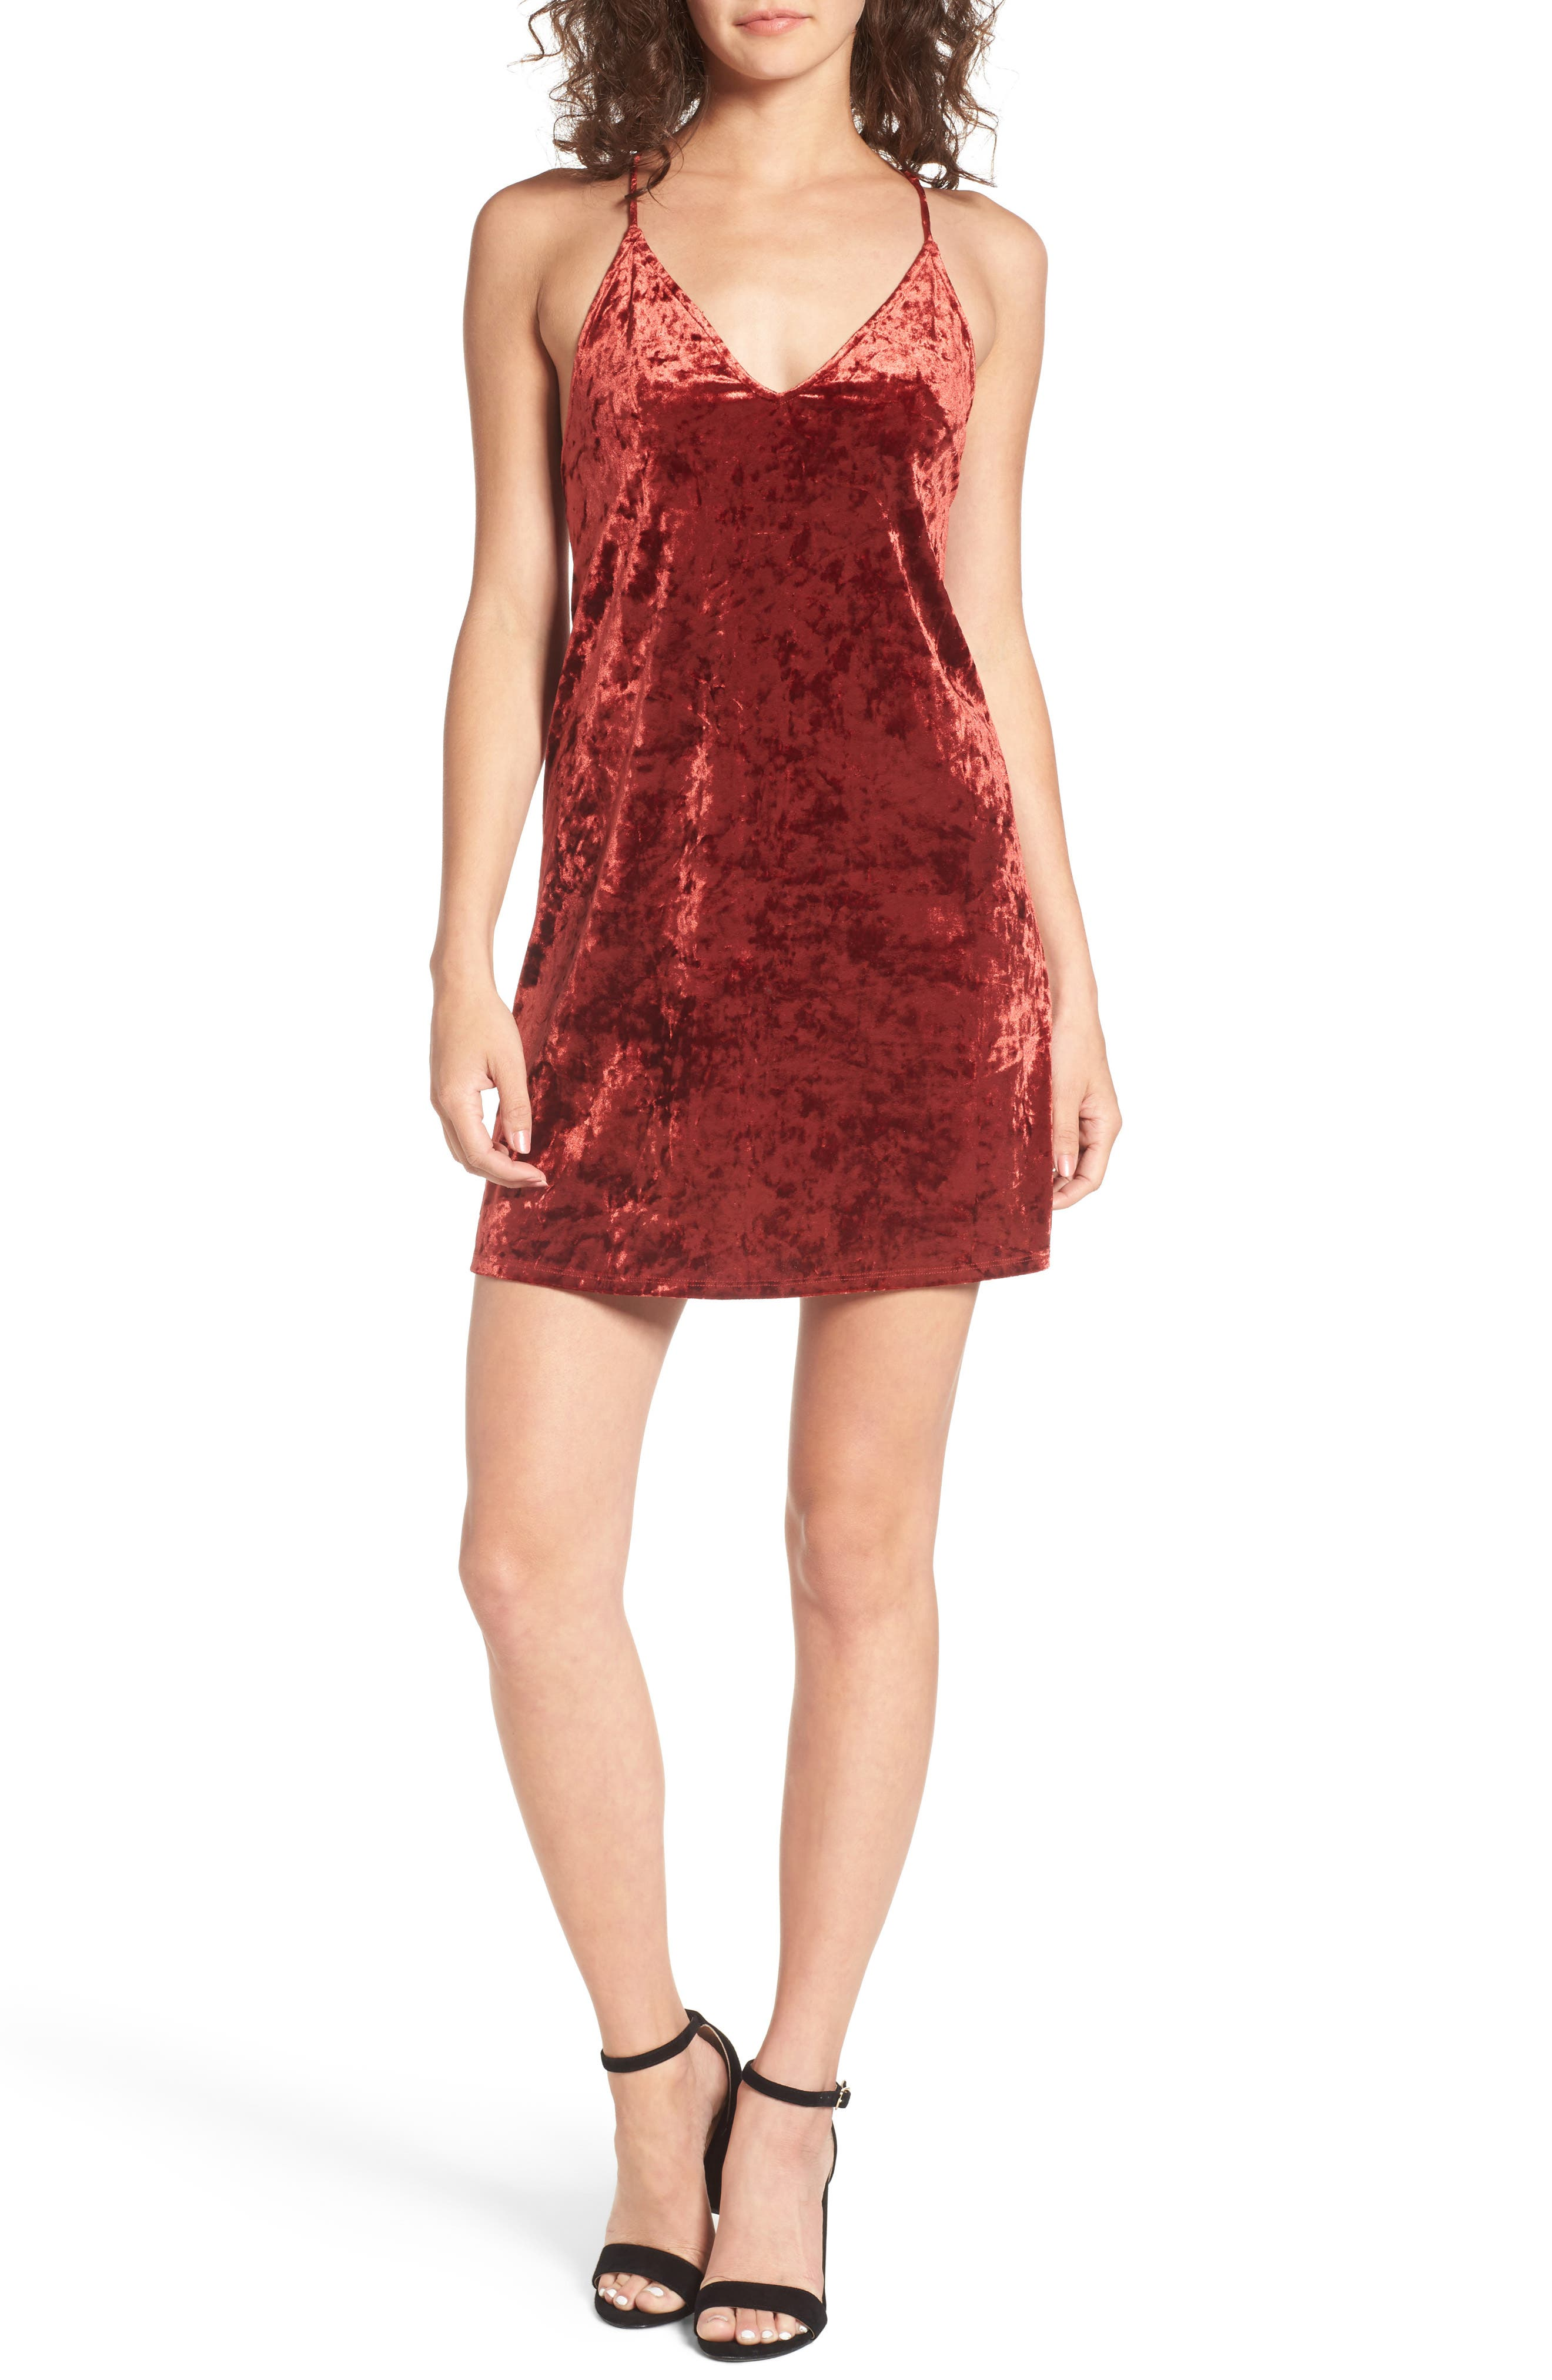 Raymore Crushed Velvet Minidress,                             Main thumbnail 1, color,